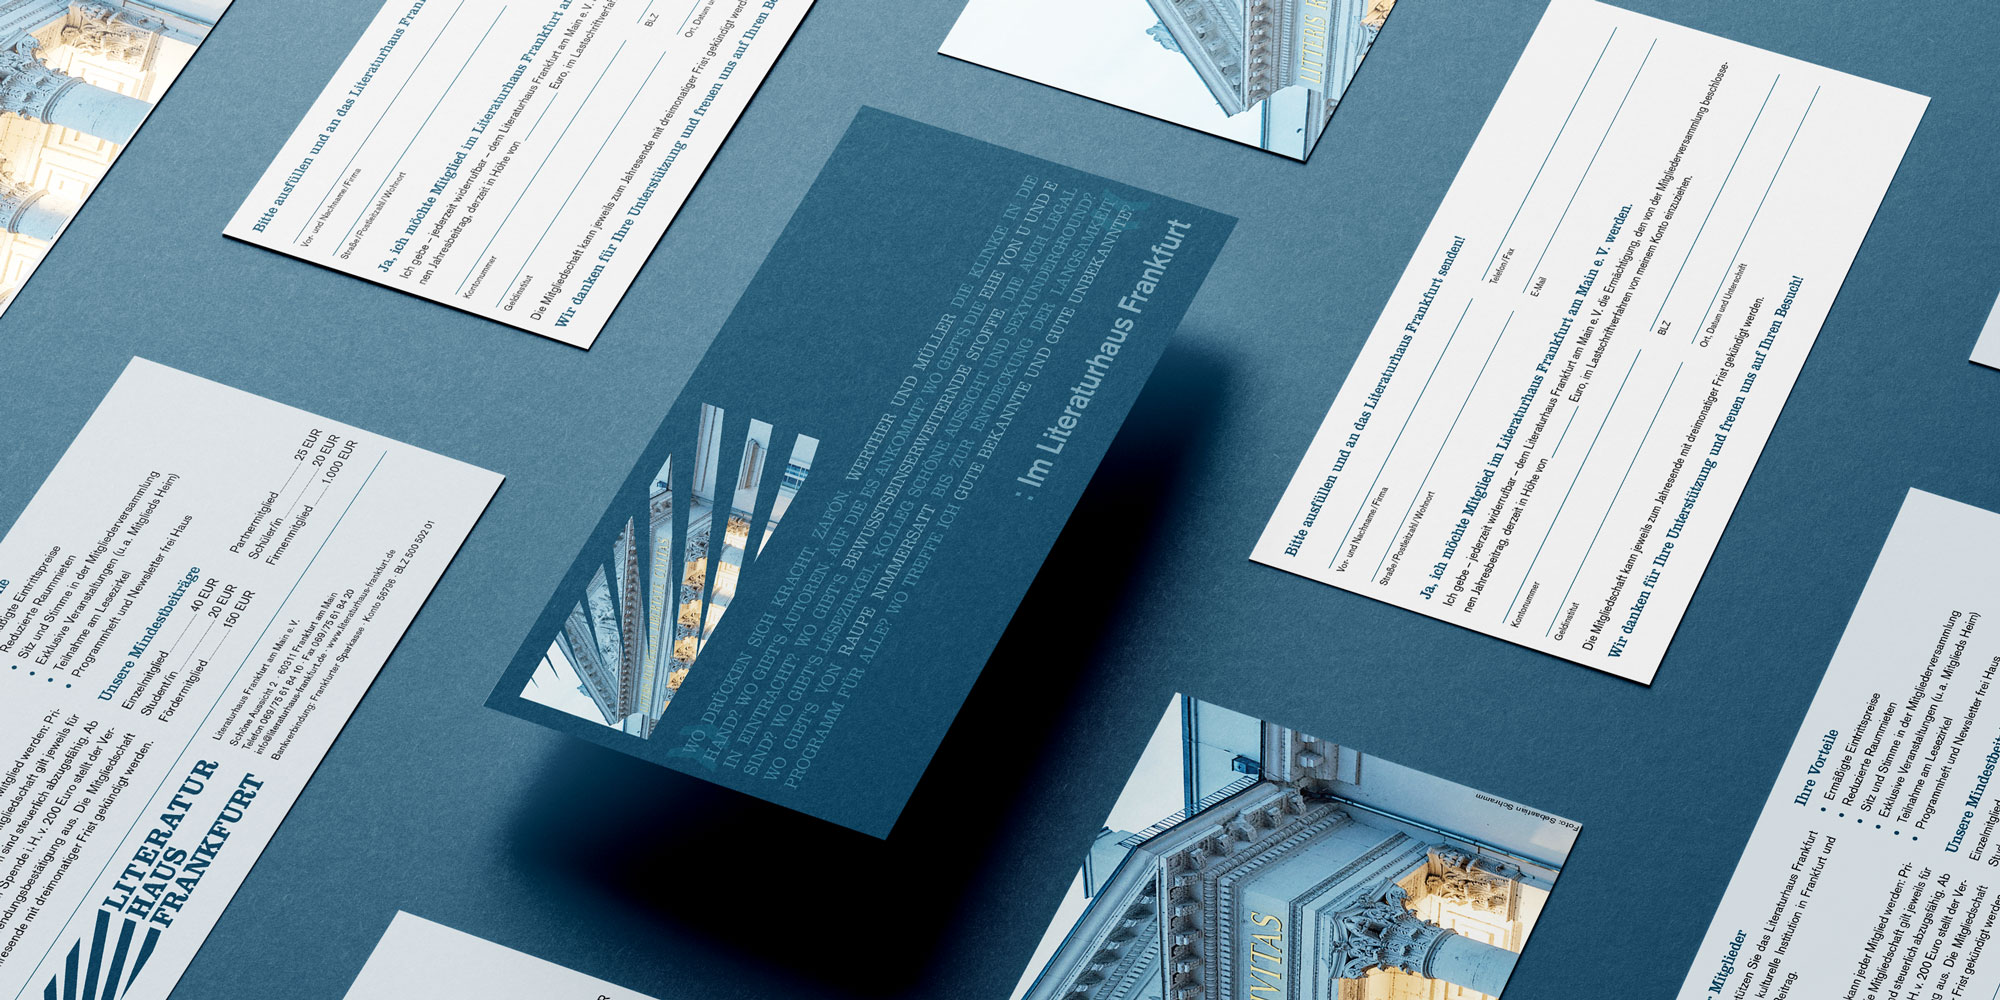 Mitgliederkarte Literaturhaus Frankfurt